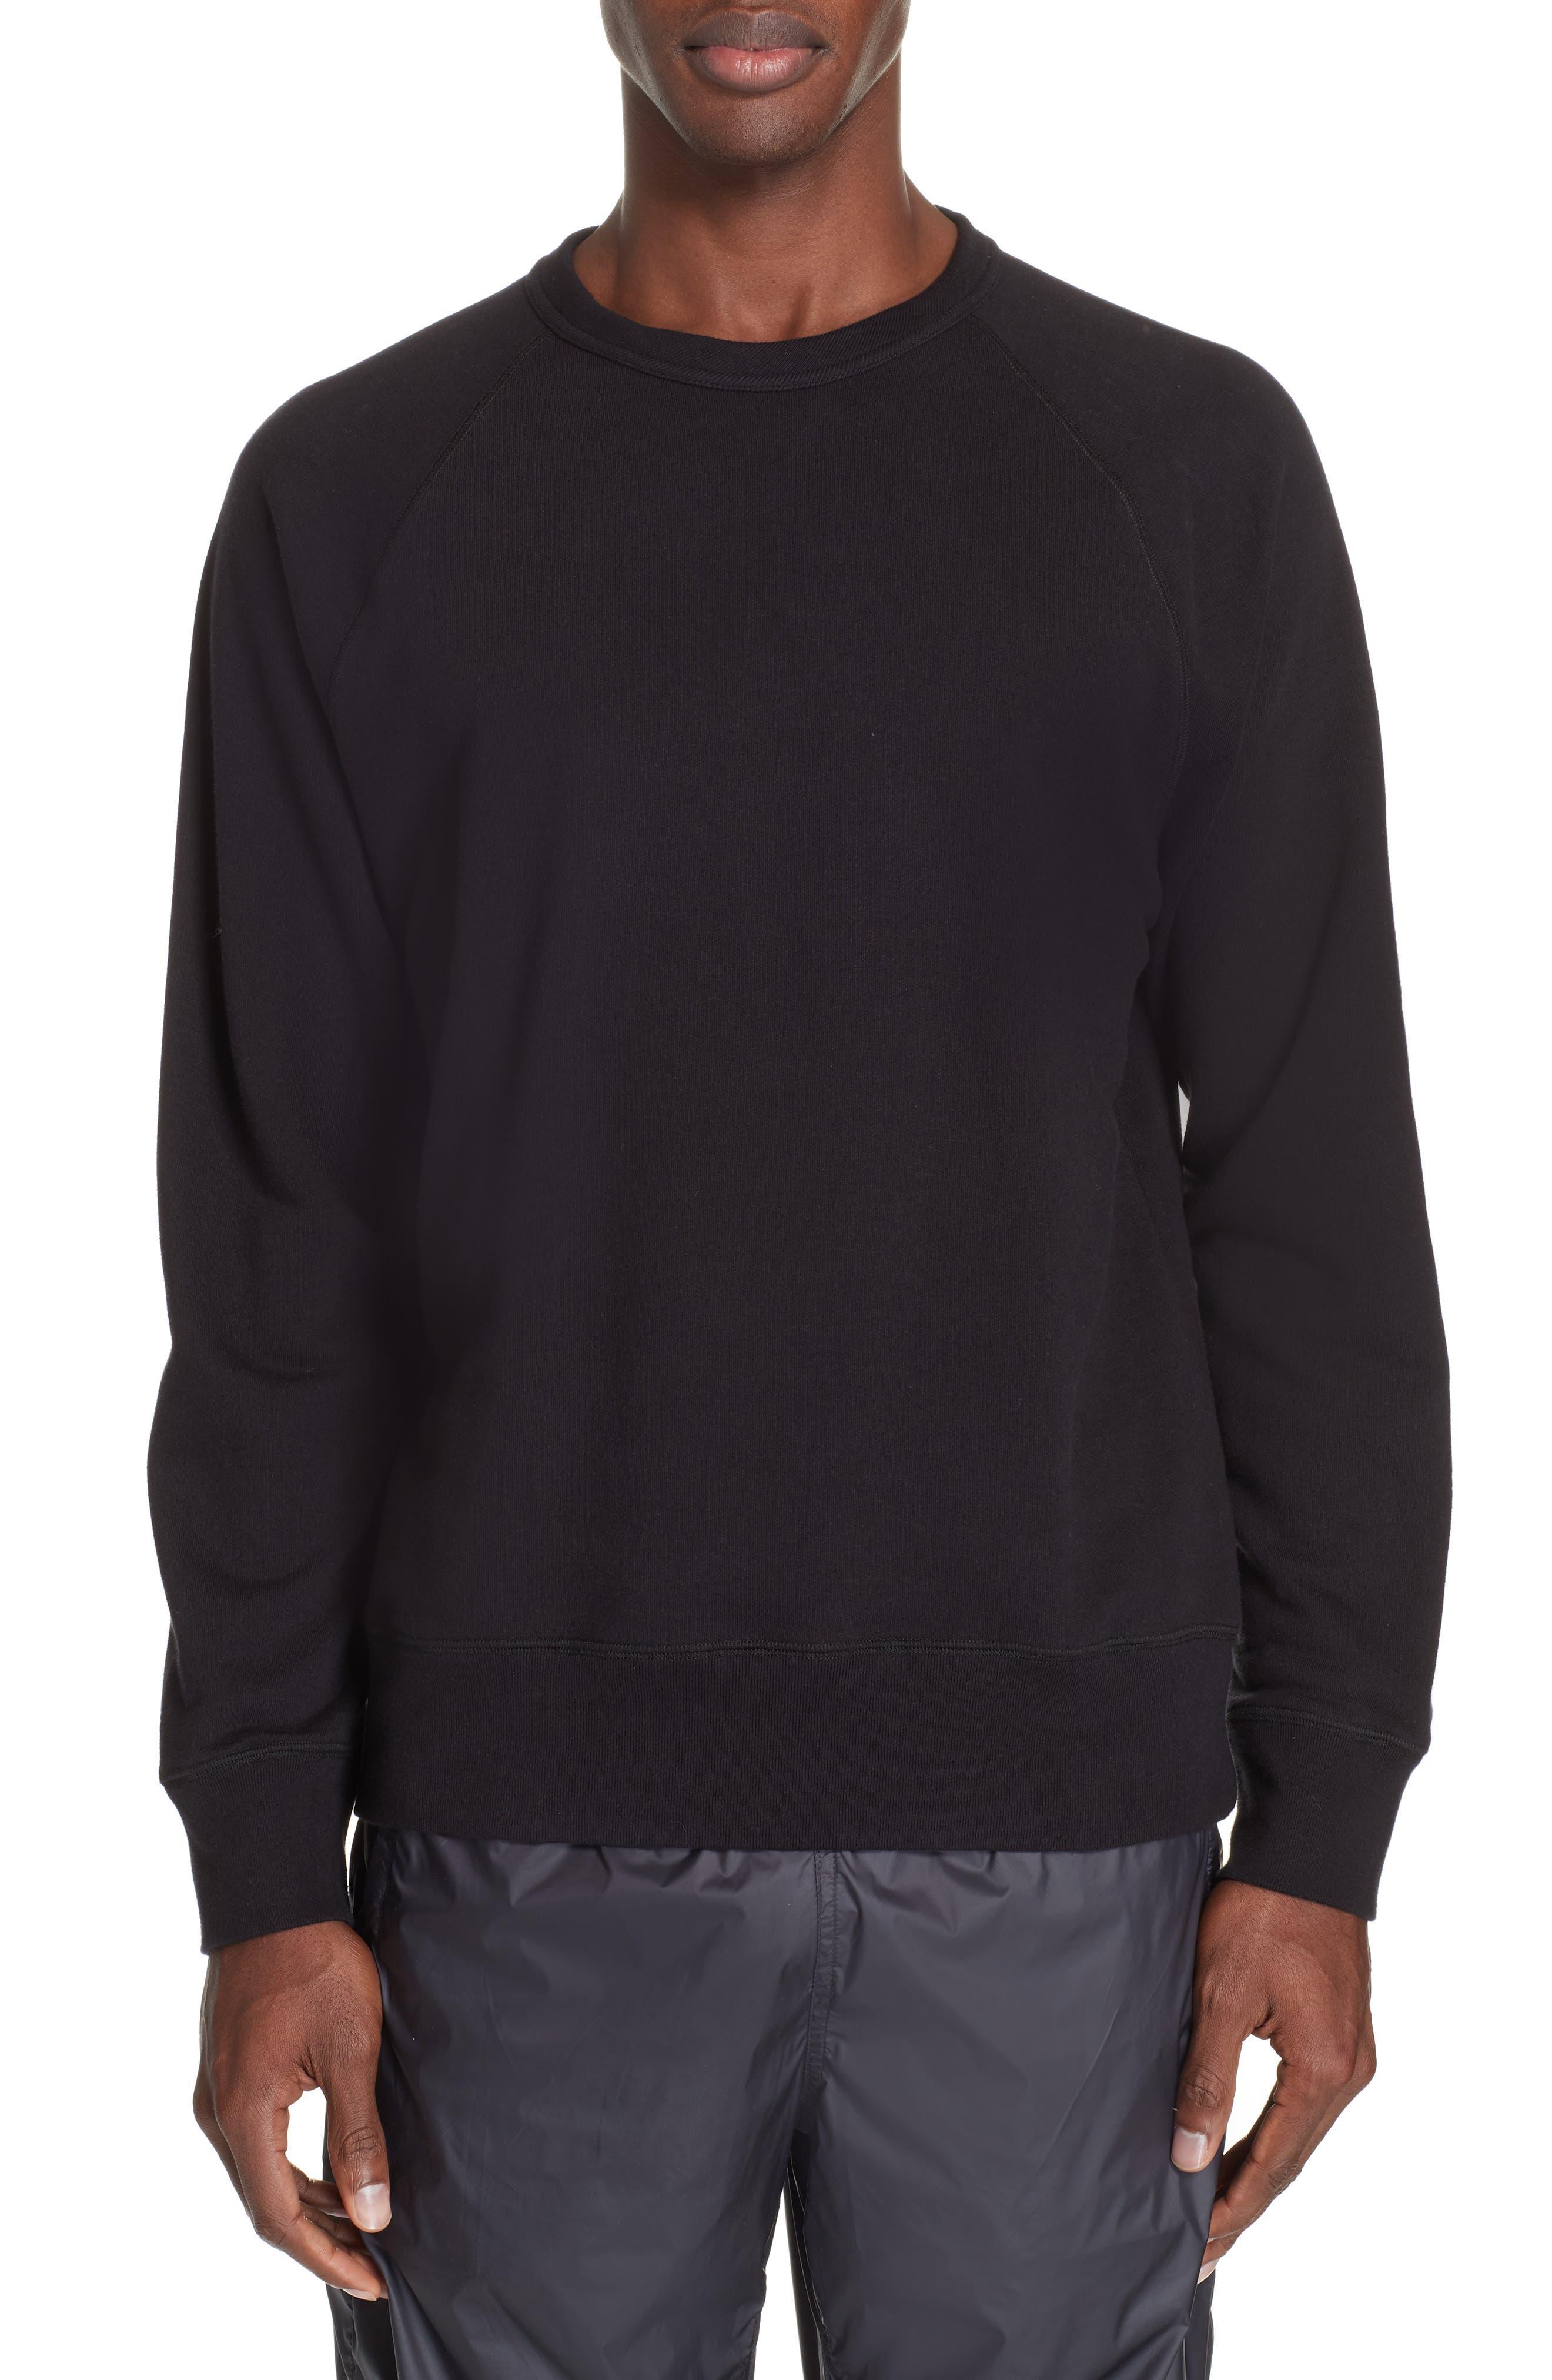 Crew Sweatshirt,                             Main thumbnail 1, color,                             BLACK LOOP SWEAT